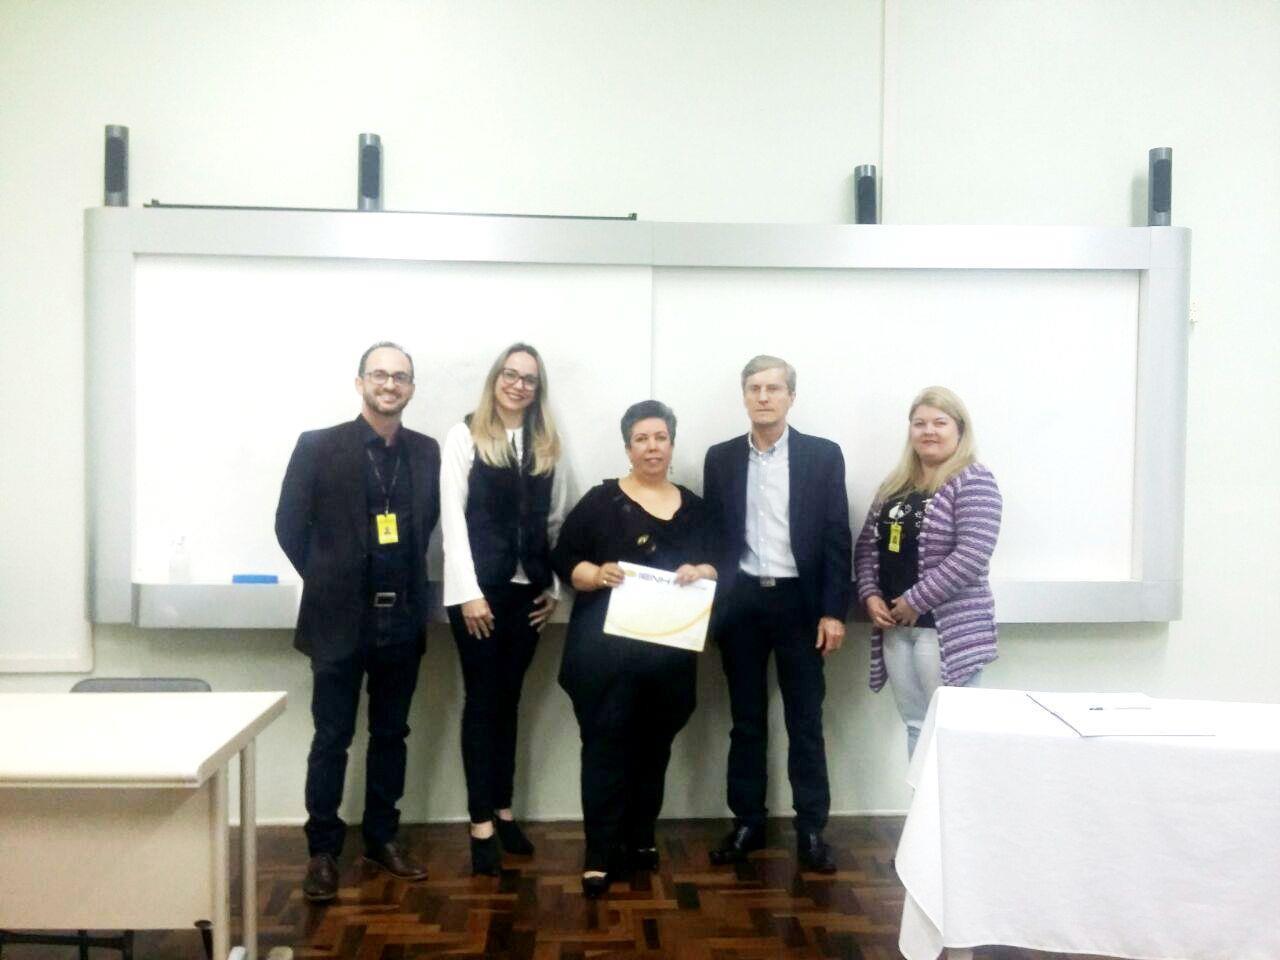 Faculdade IENH realiza Formatura do Curso de Psicologia